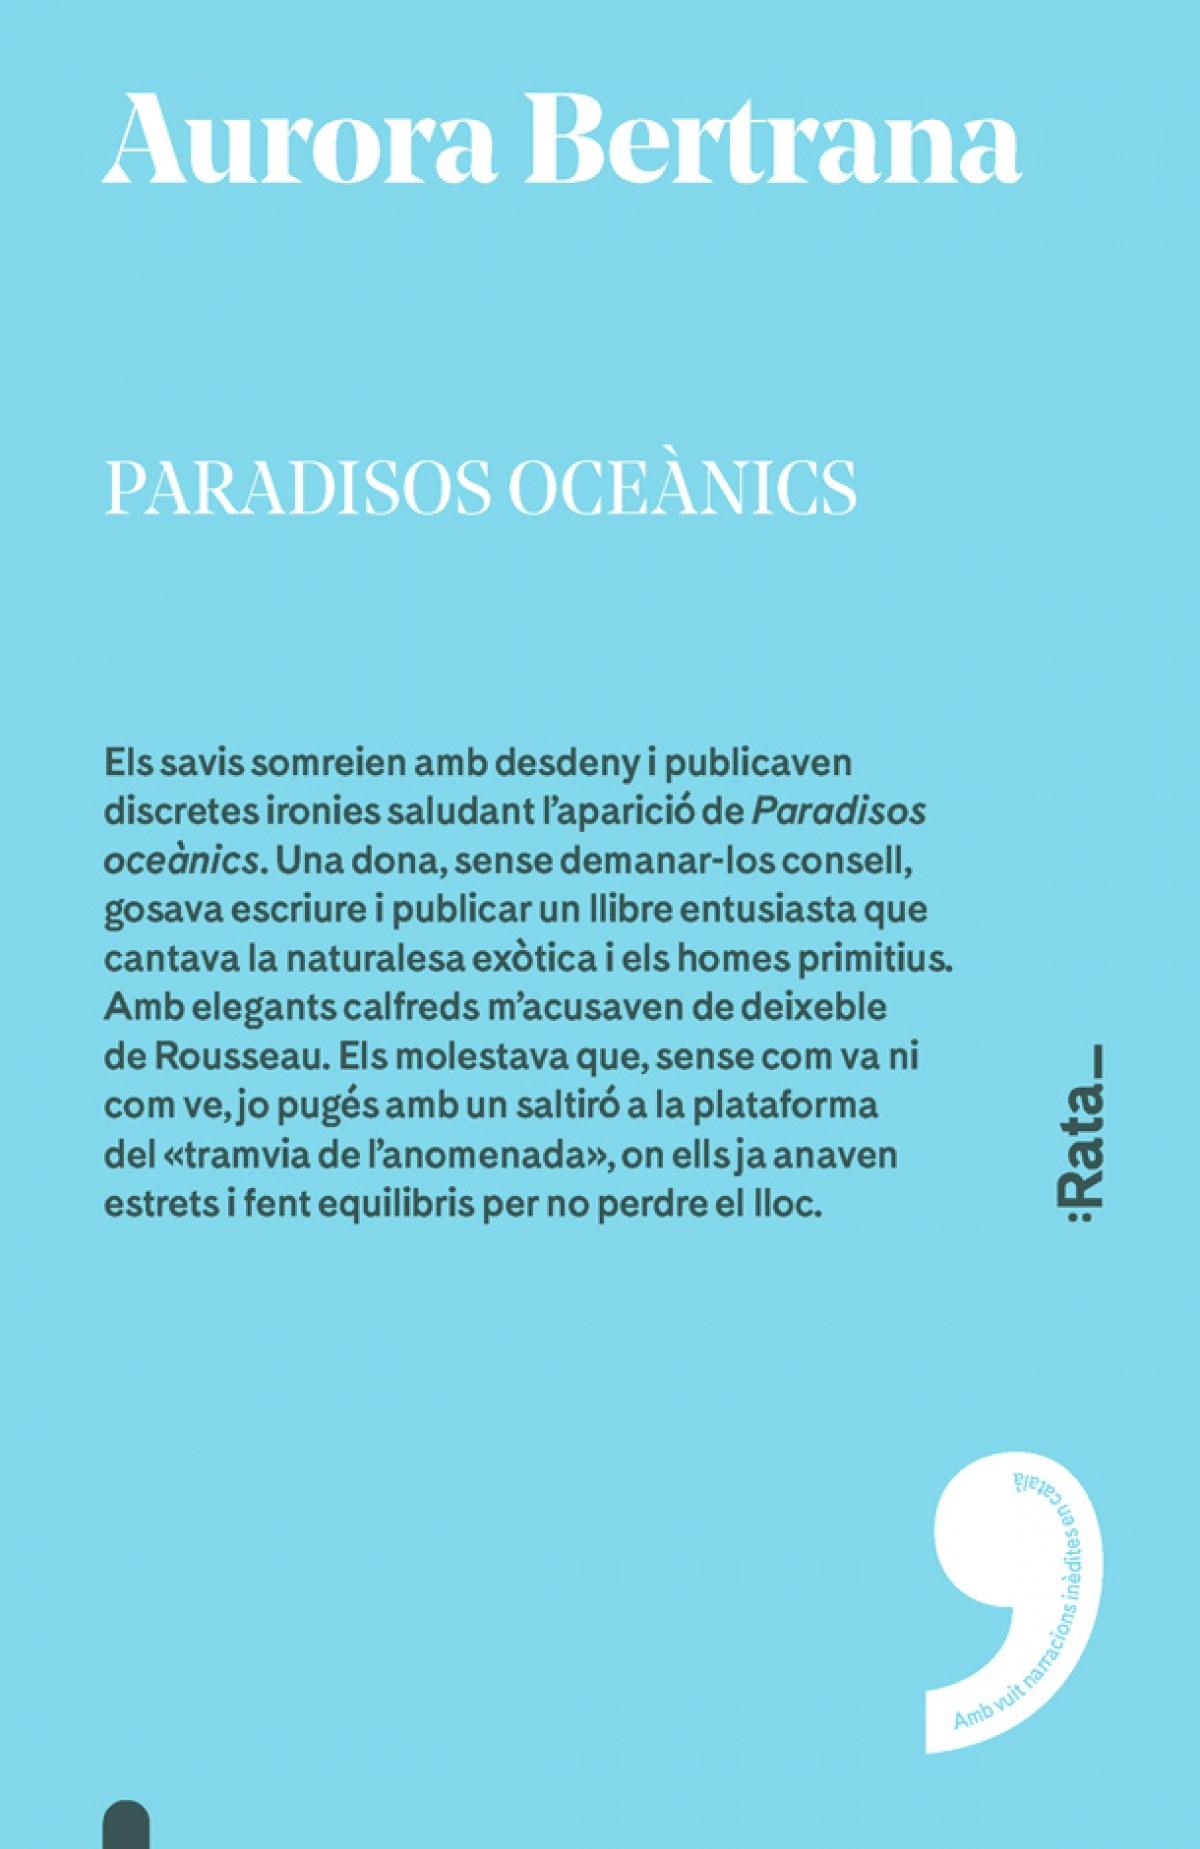 PARADISOS OCEÀNICS 9788416738335